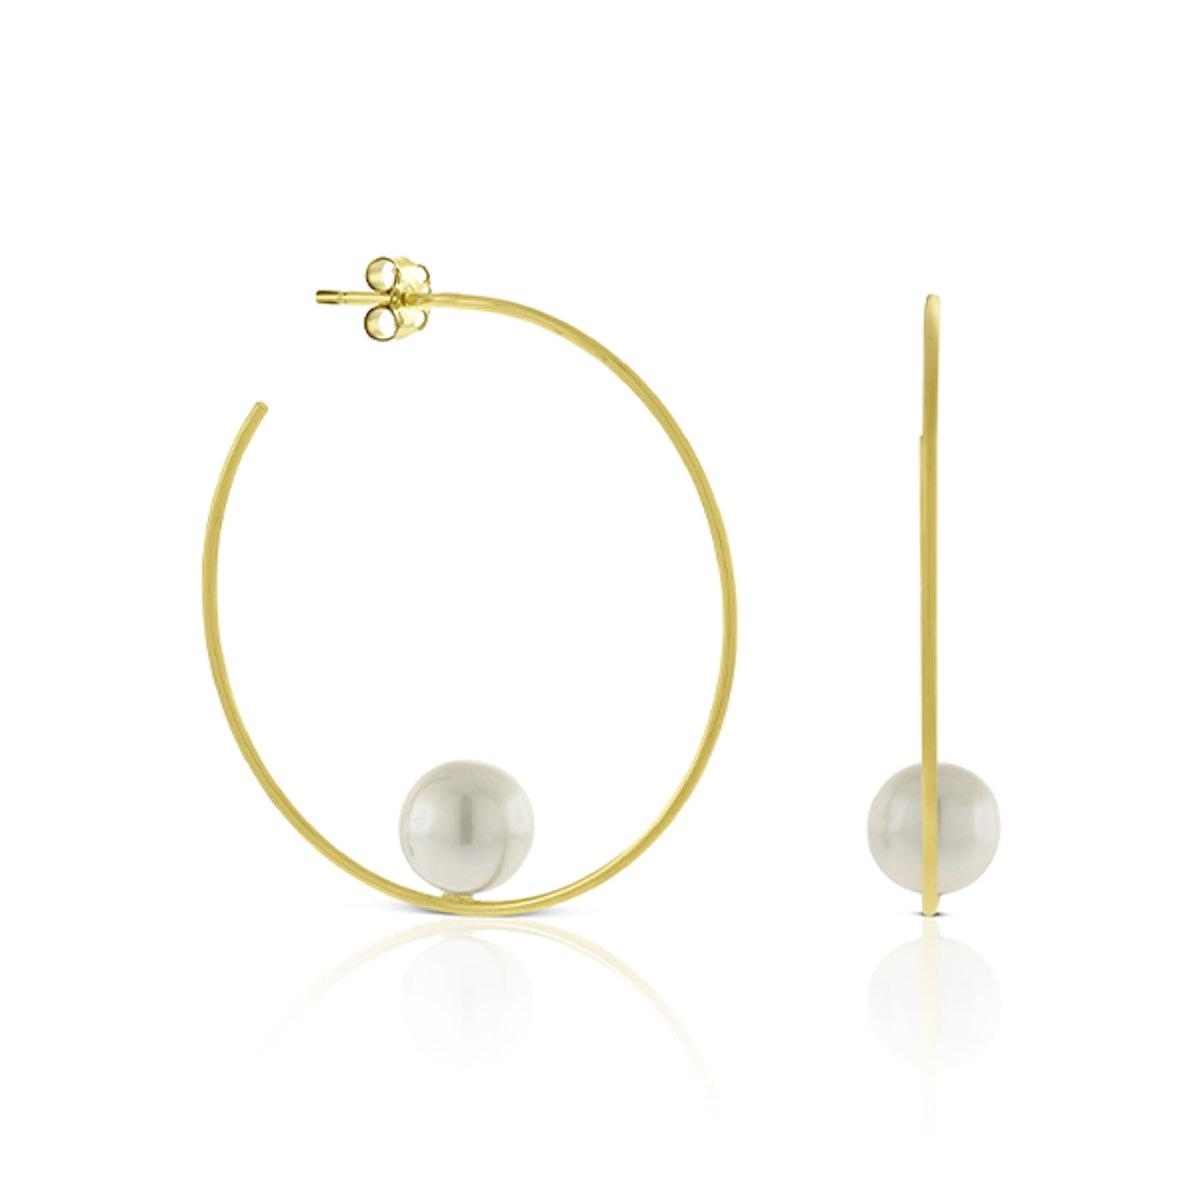 Balanced Cultured Pearl Hoop Earrings in 14K Yellow Gold